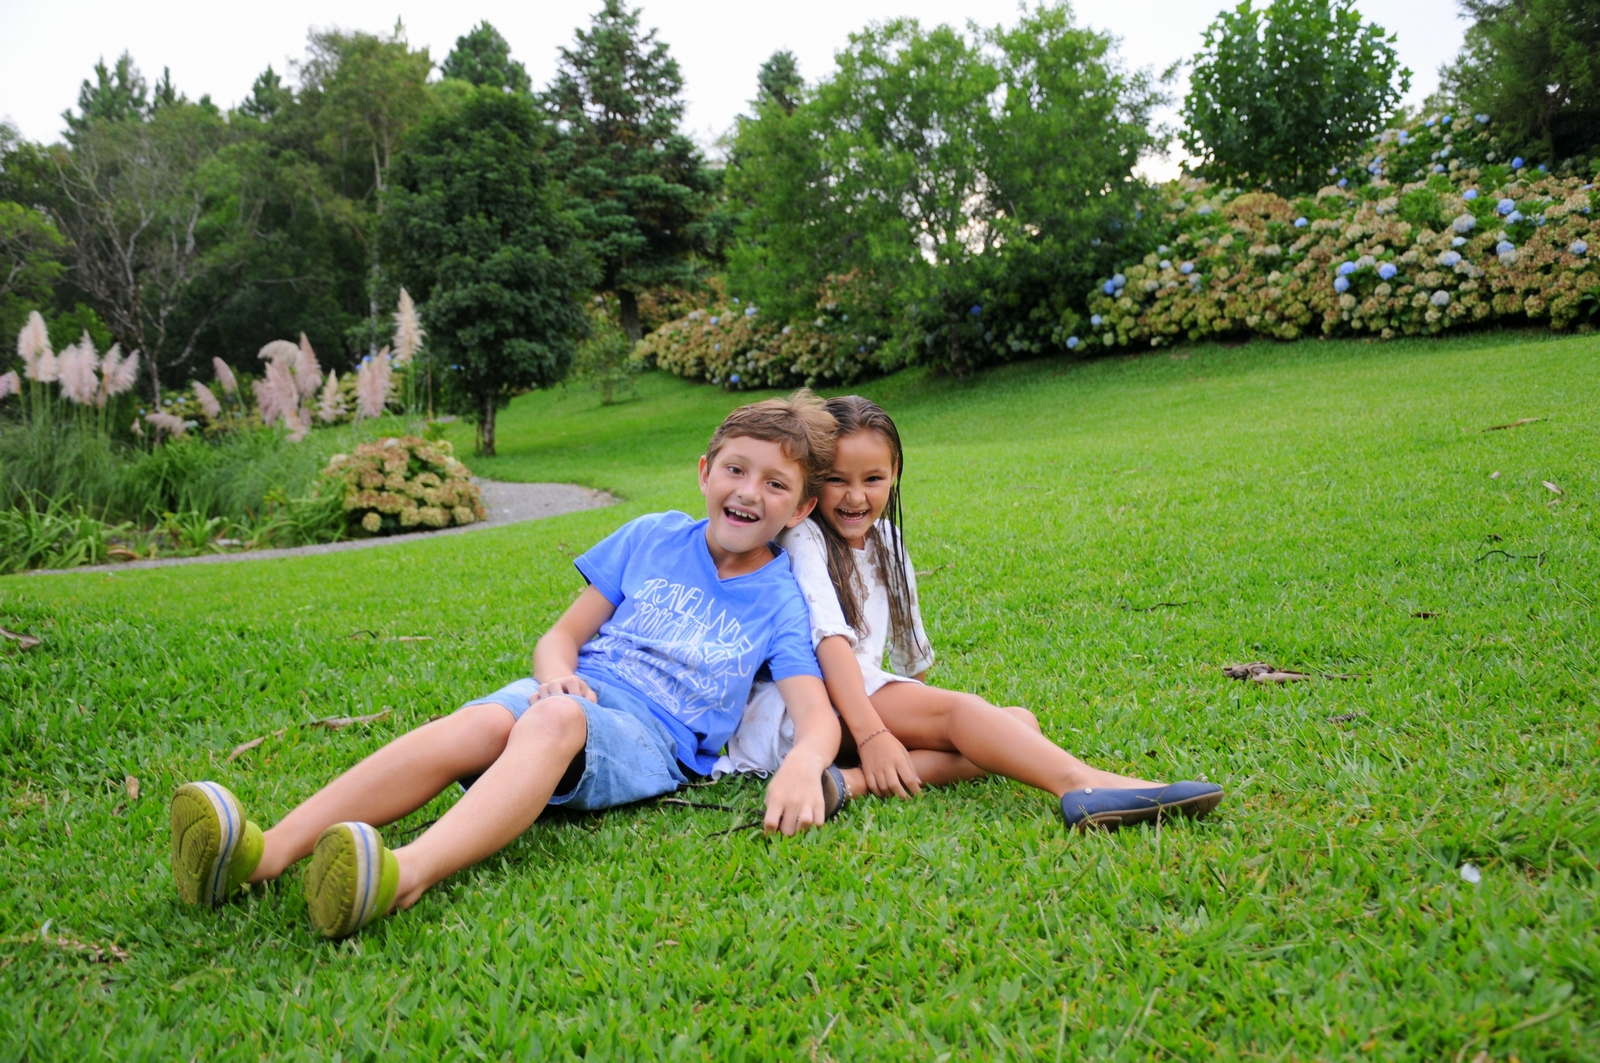 Crianças - PlayGround - Jardim